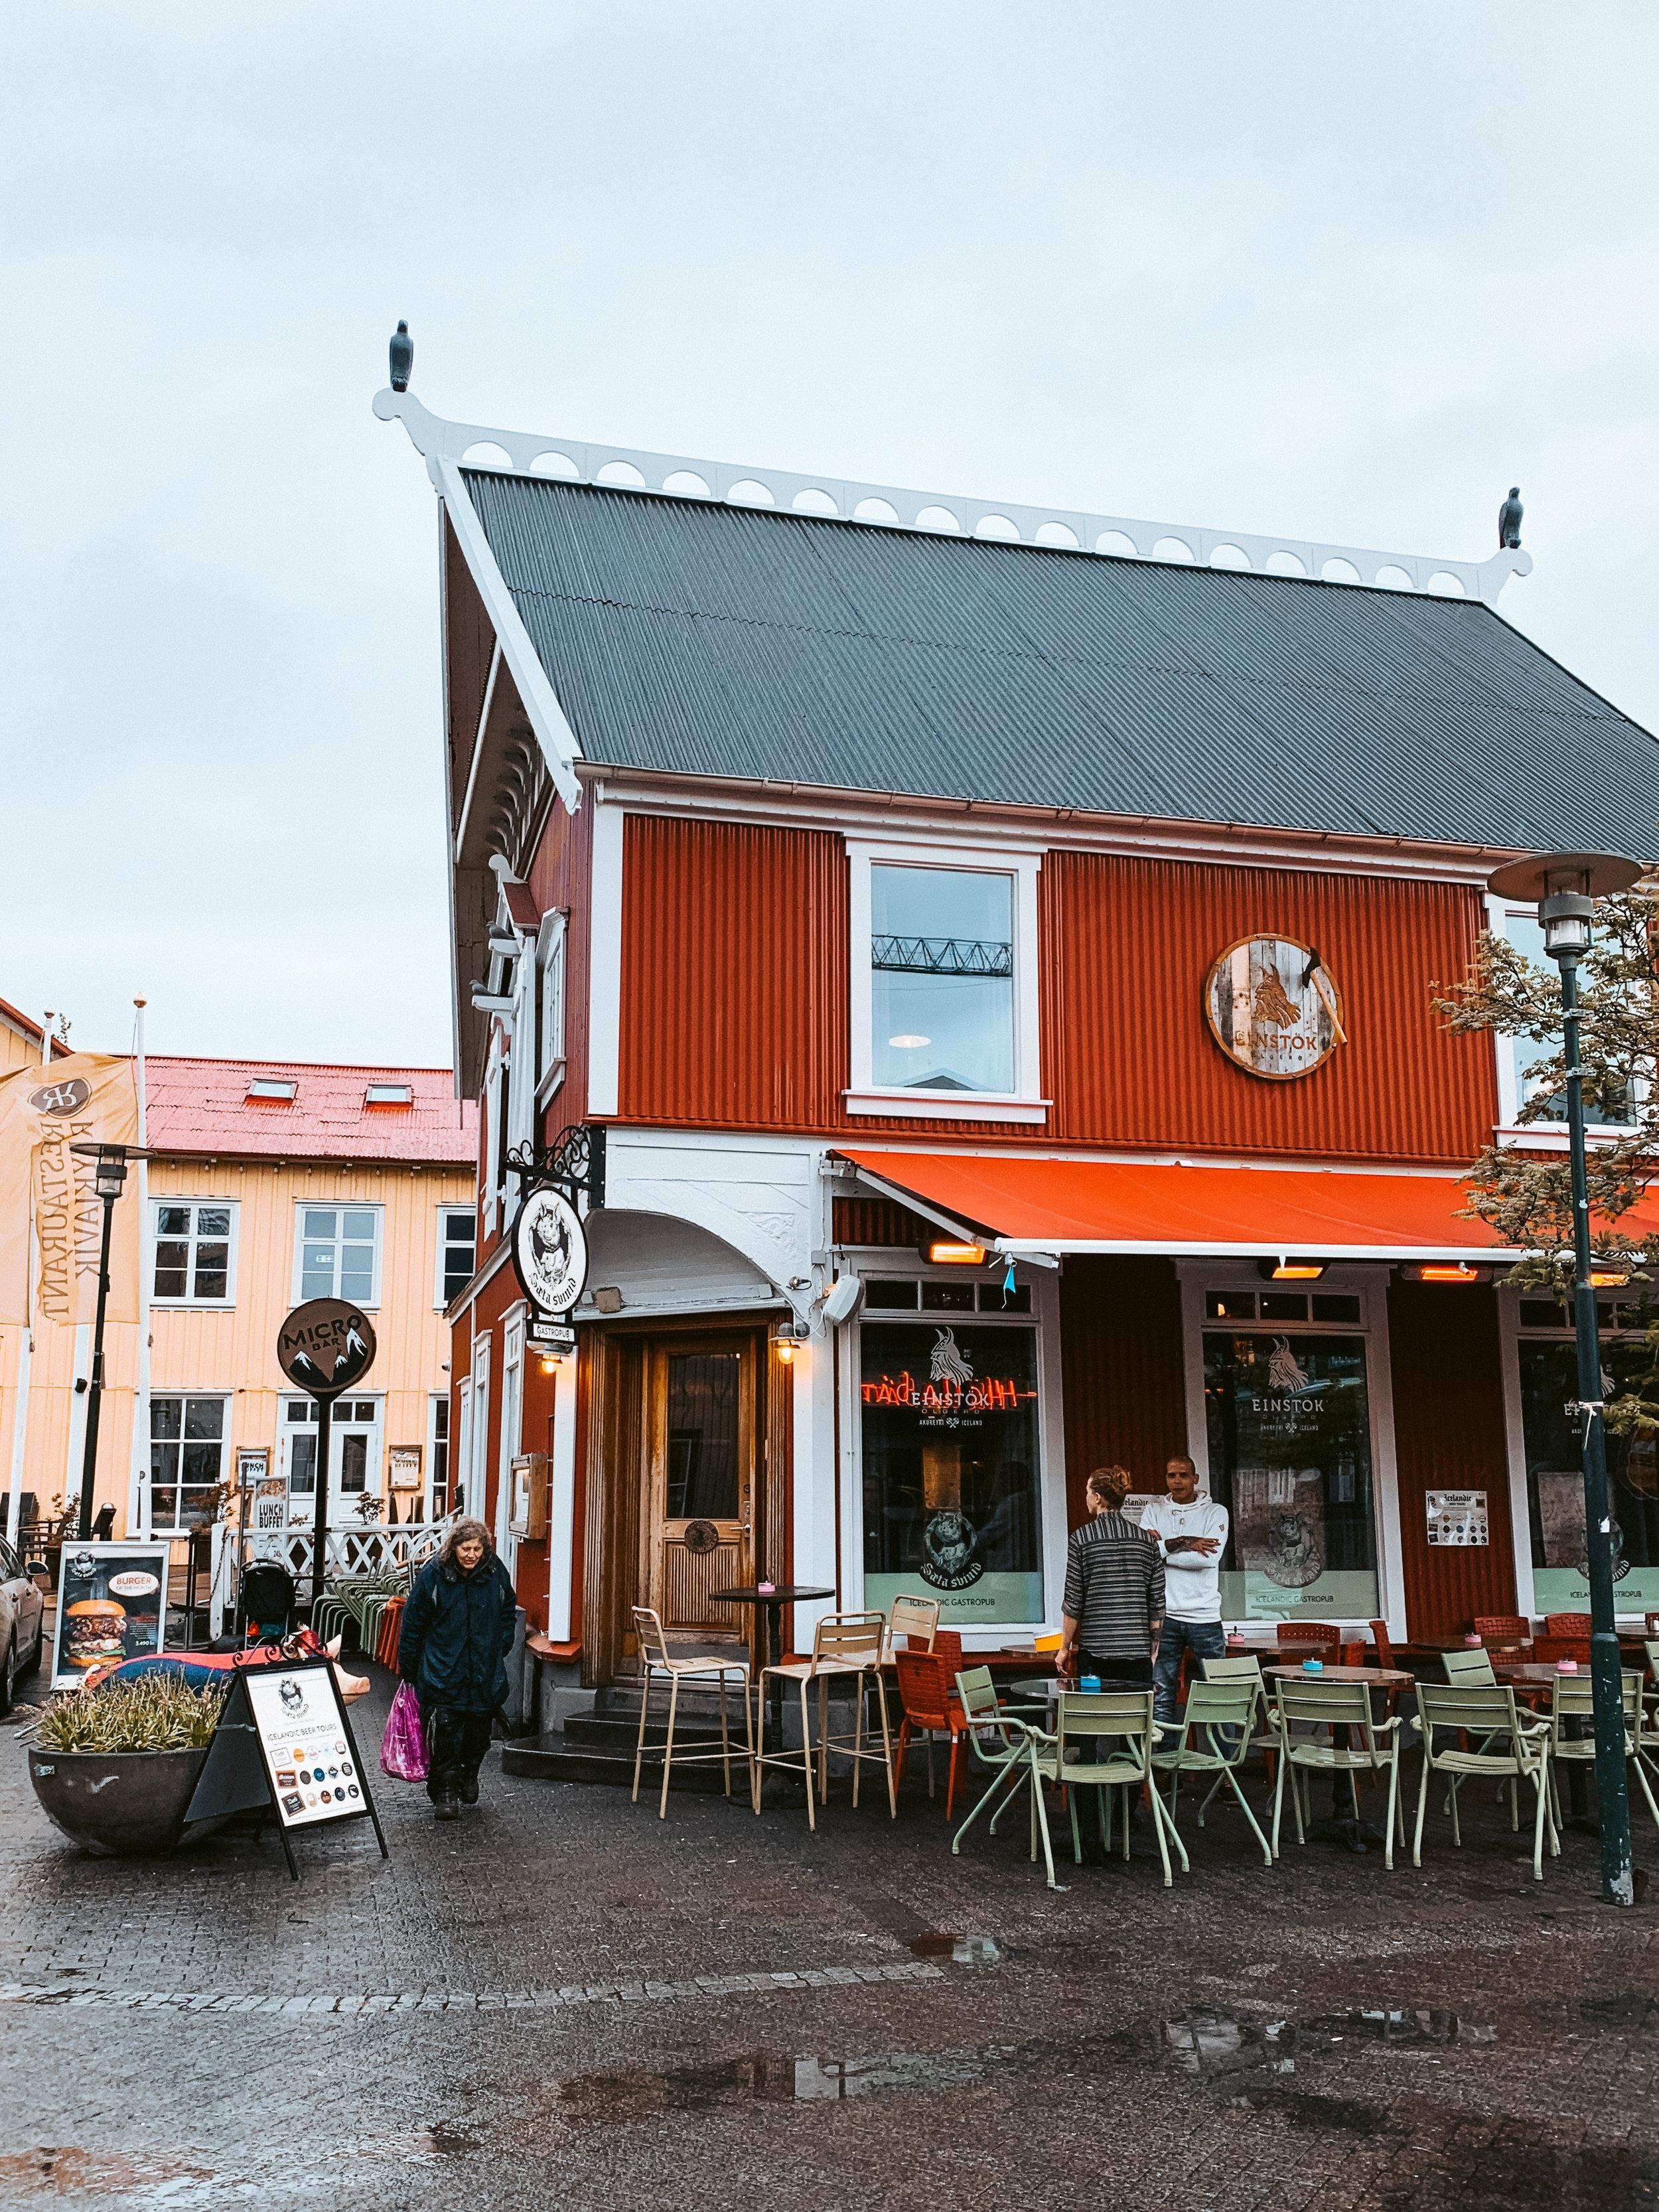 LSS Downtown Reykjavik Iceland Bar